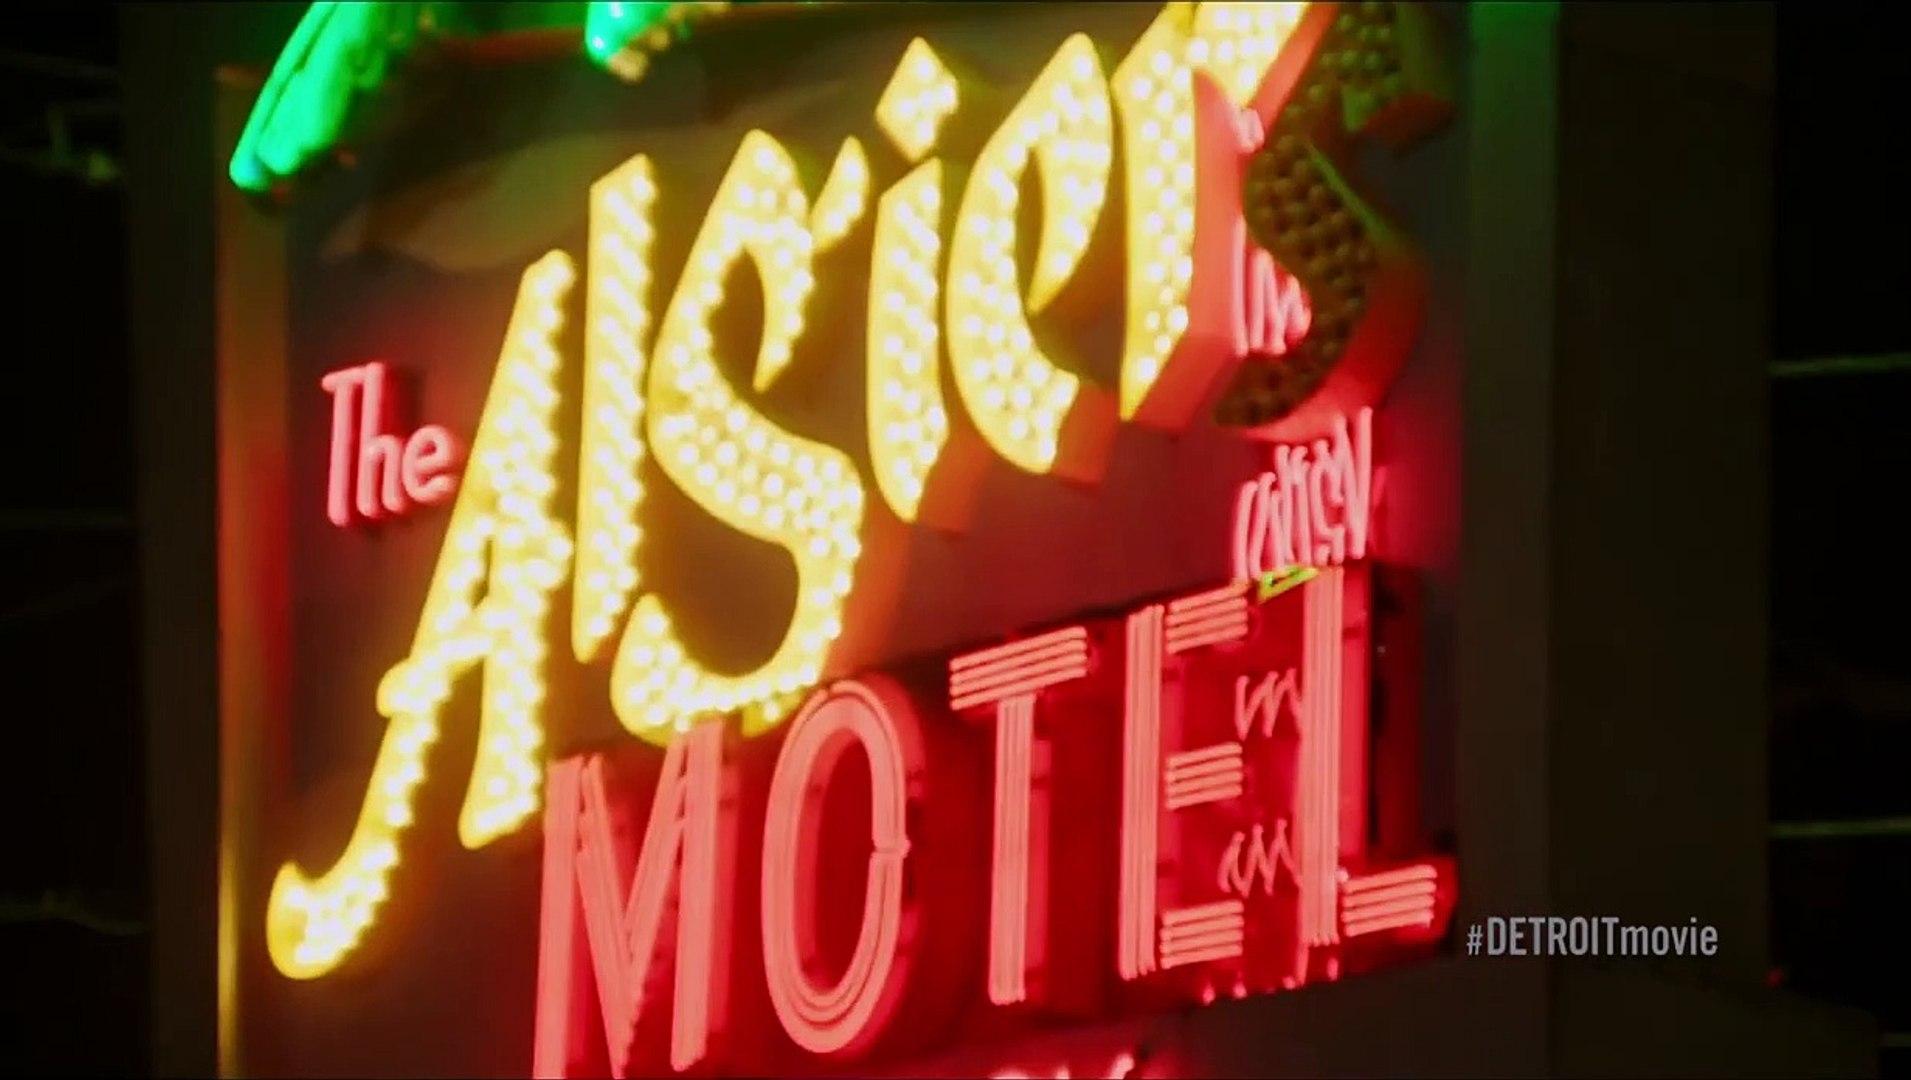 Detroit Trailer Final Trailer (2017) - Movieclips Trailers